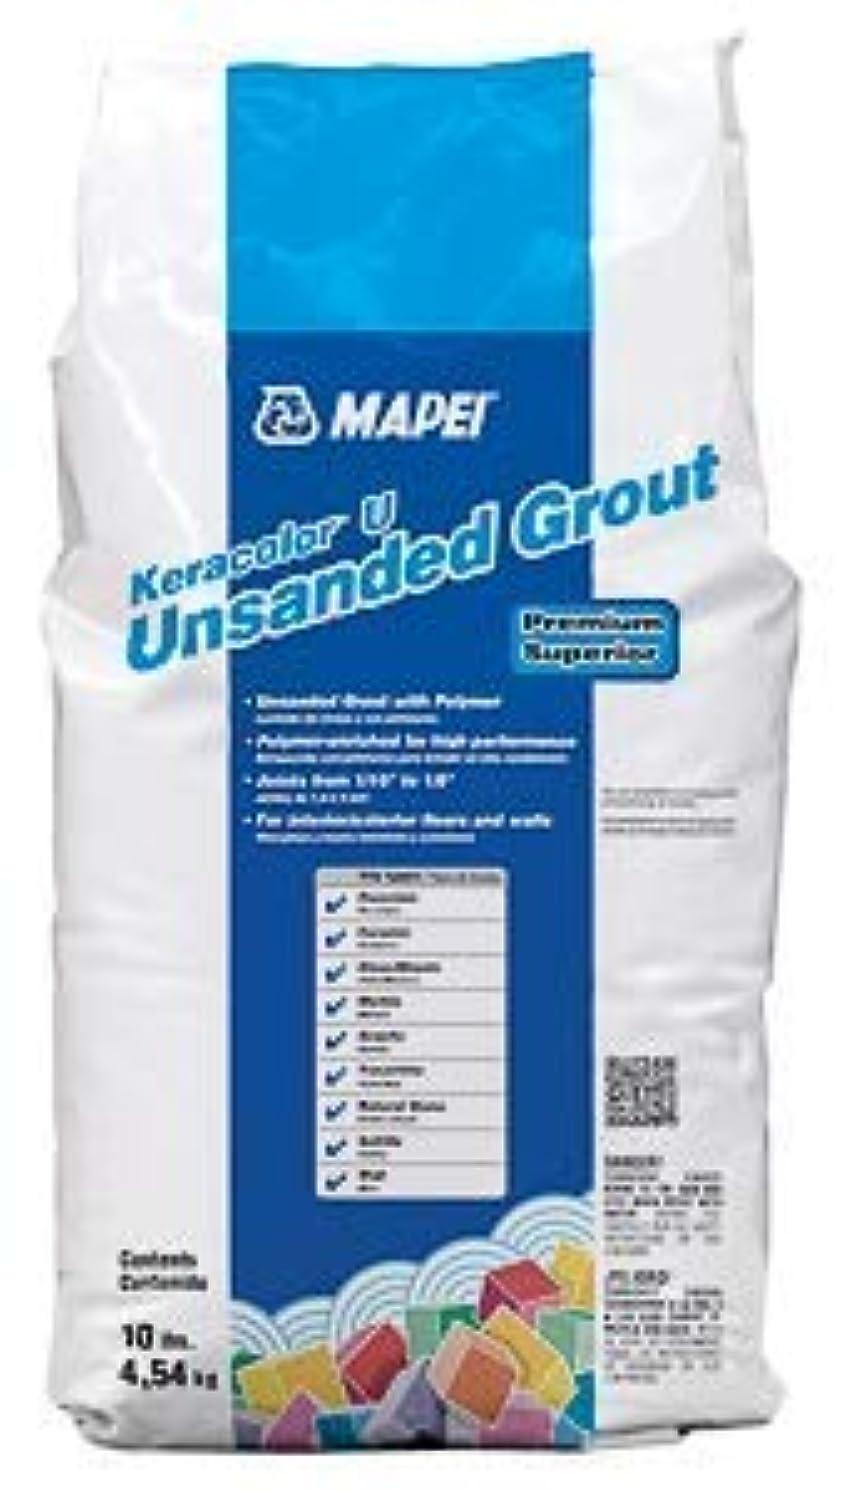 MAPEI Keracolor U UnSanded Powder Grout - 10LB/Bag - Premium Superior (00 White)